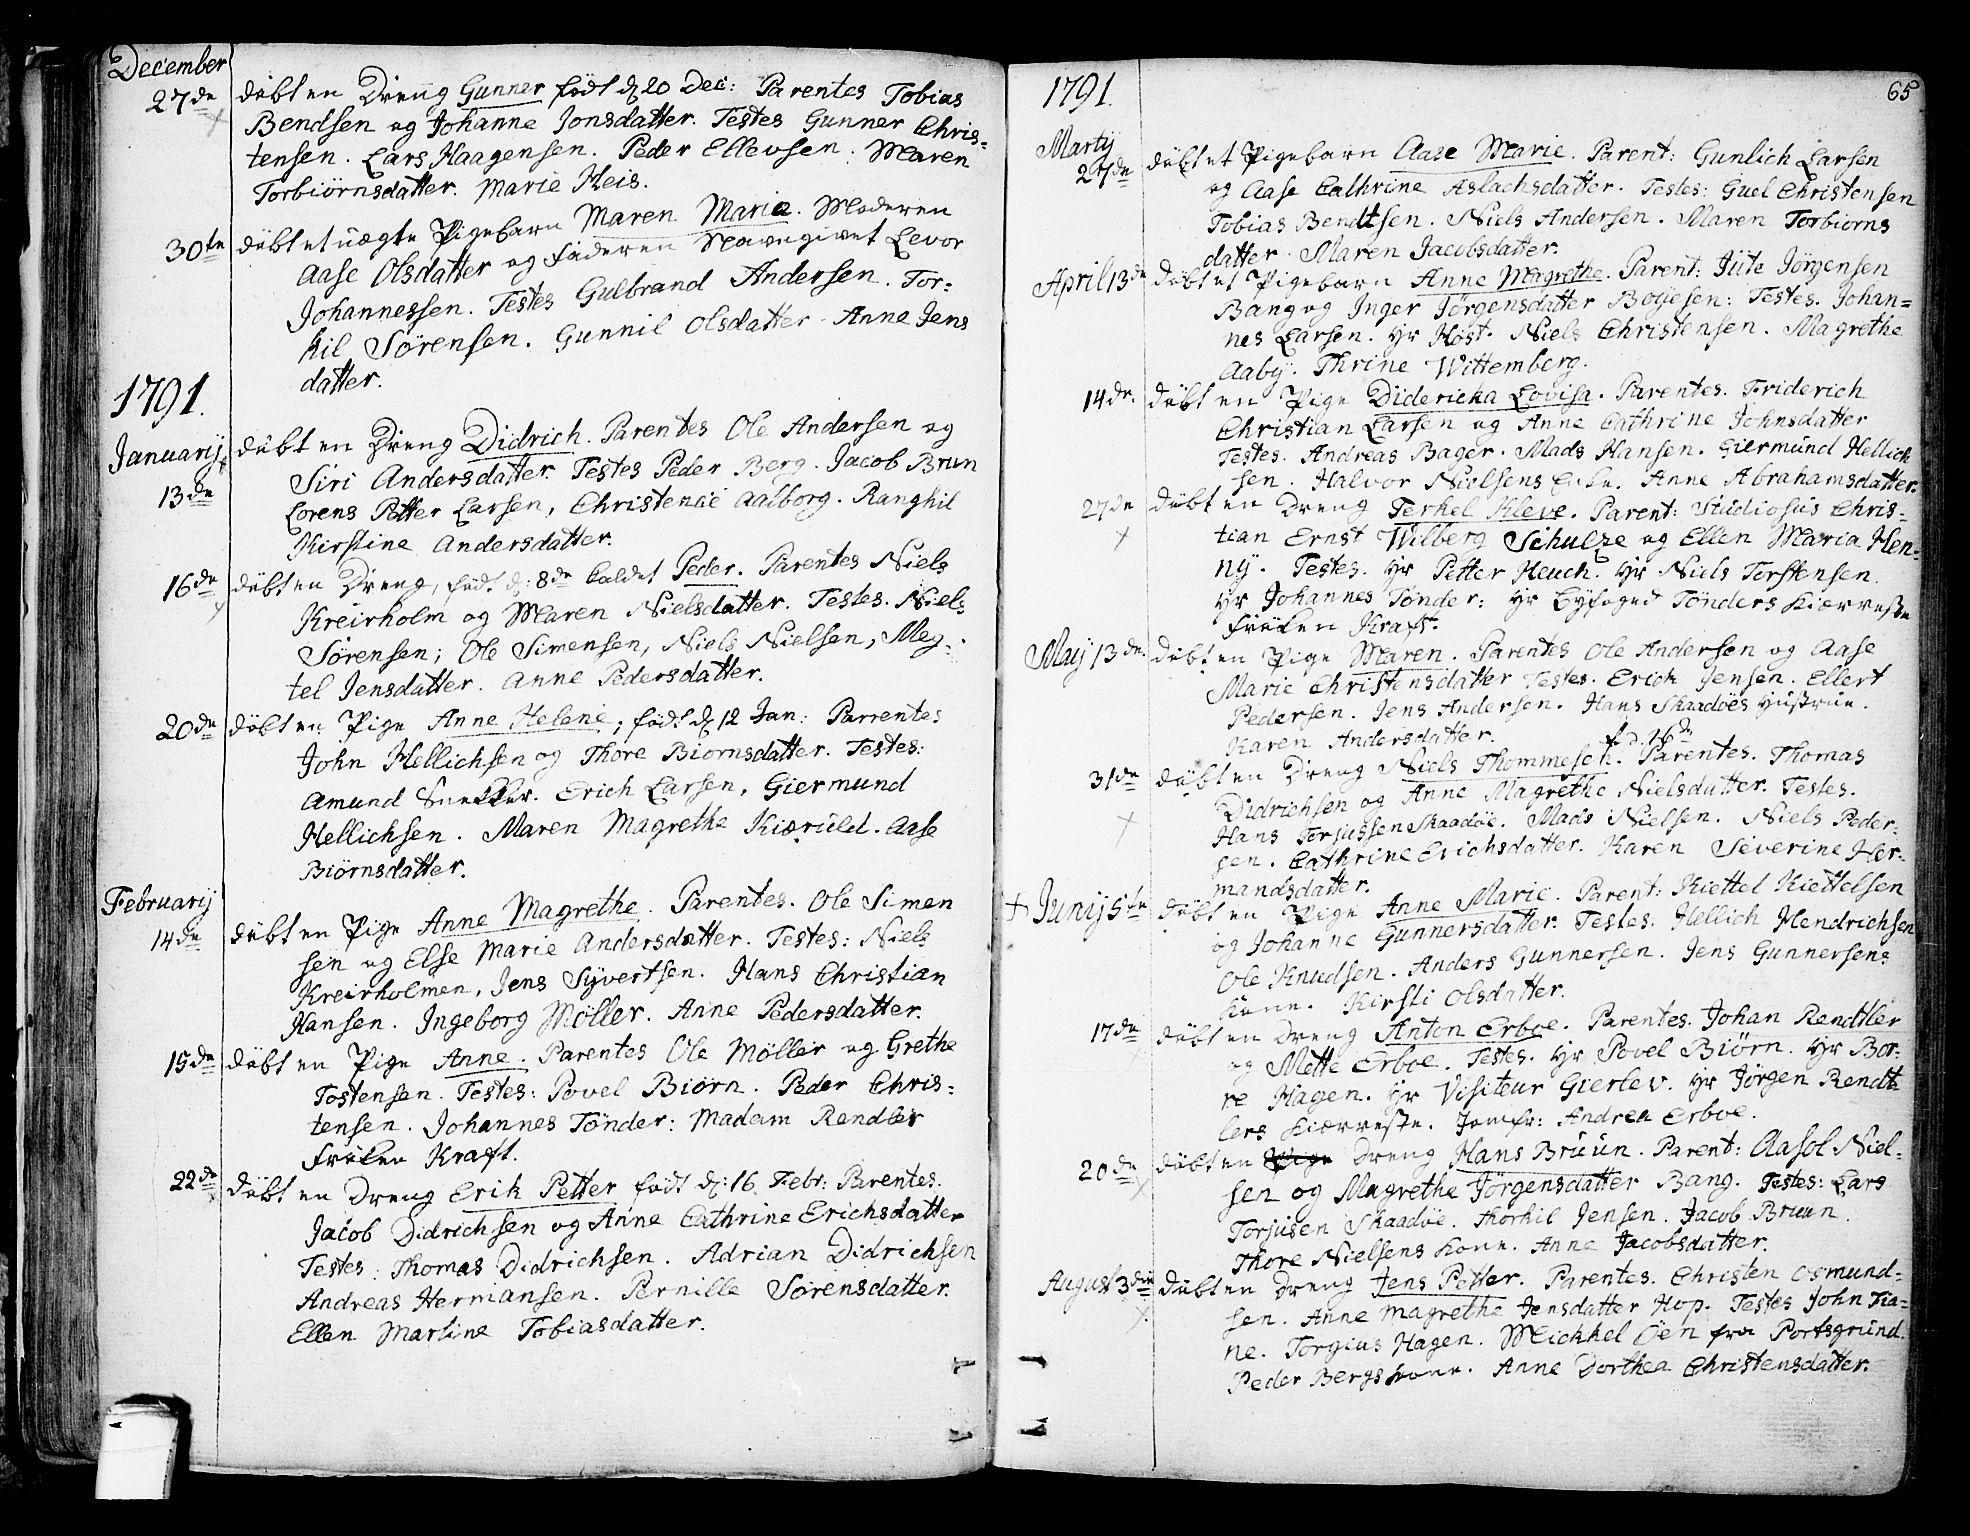 SAKO, Kragerø kirkebøker, F/Fa/L0002: Ministerialbok nr. 2, 1767-1802, s. 65